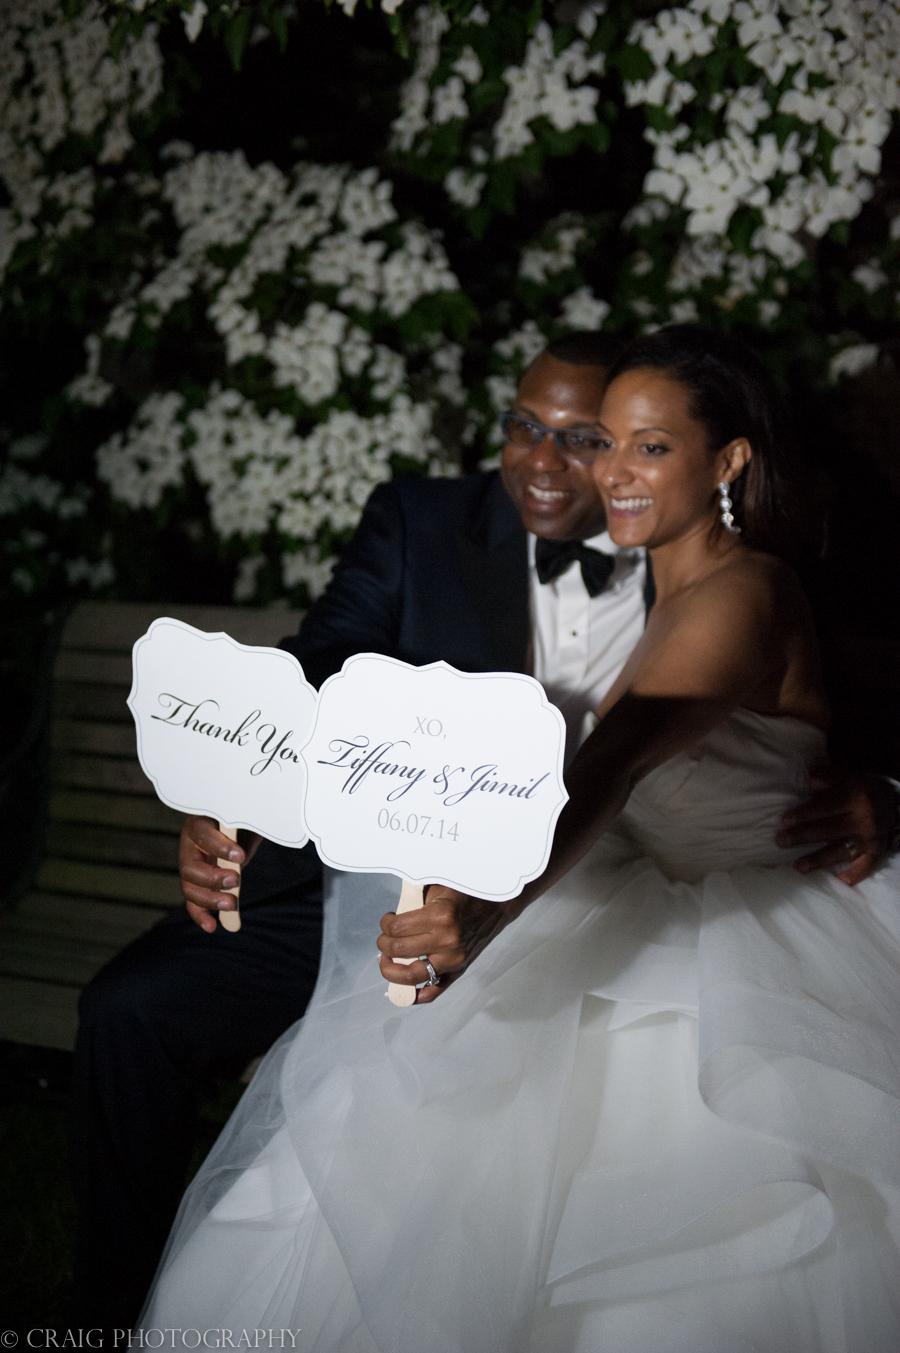 Phipps Conseratory Weddings | Wedding Photo Booth Homemade Moss Frame-0013